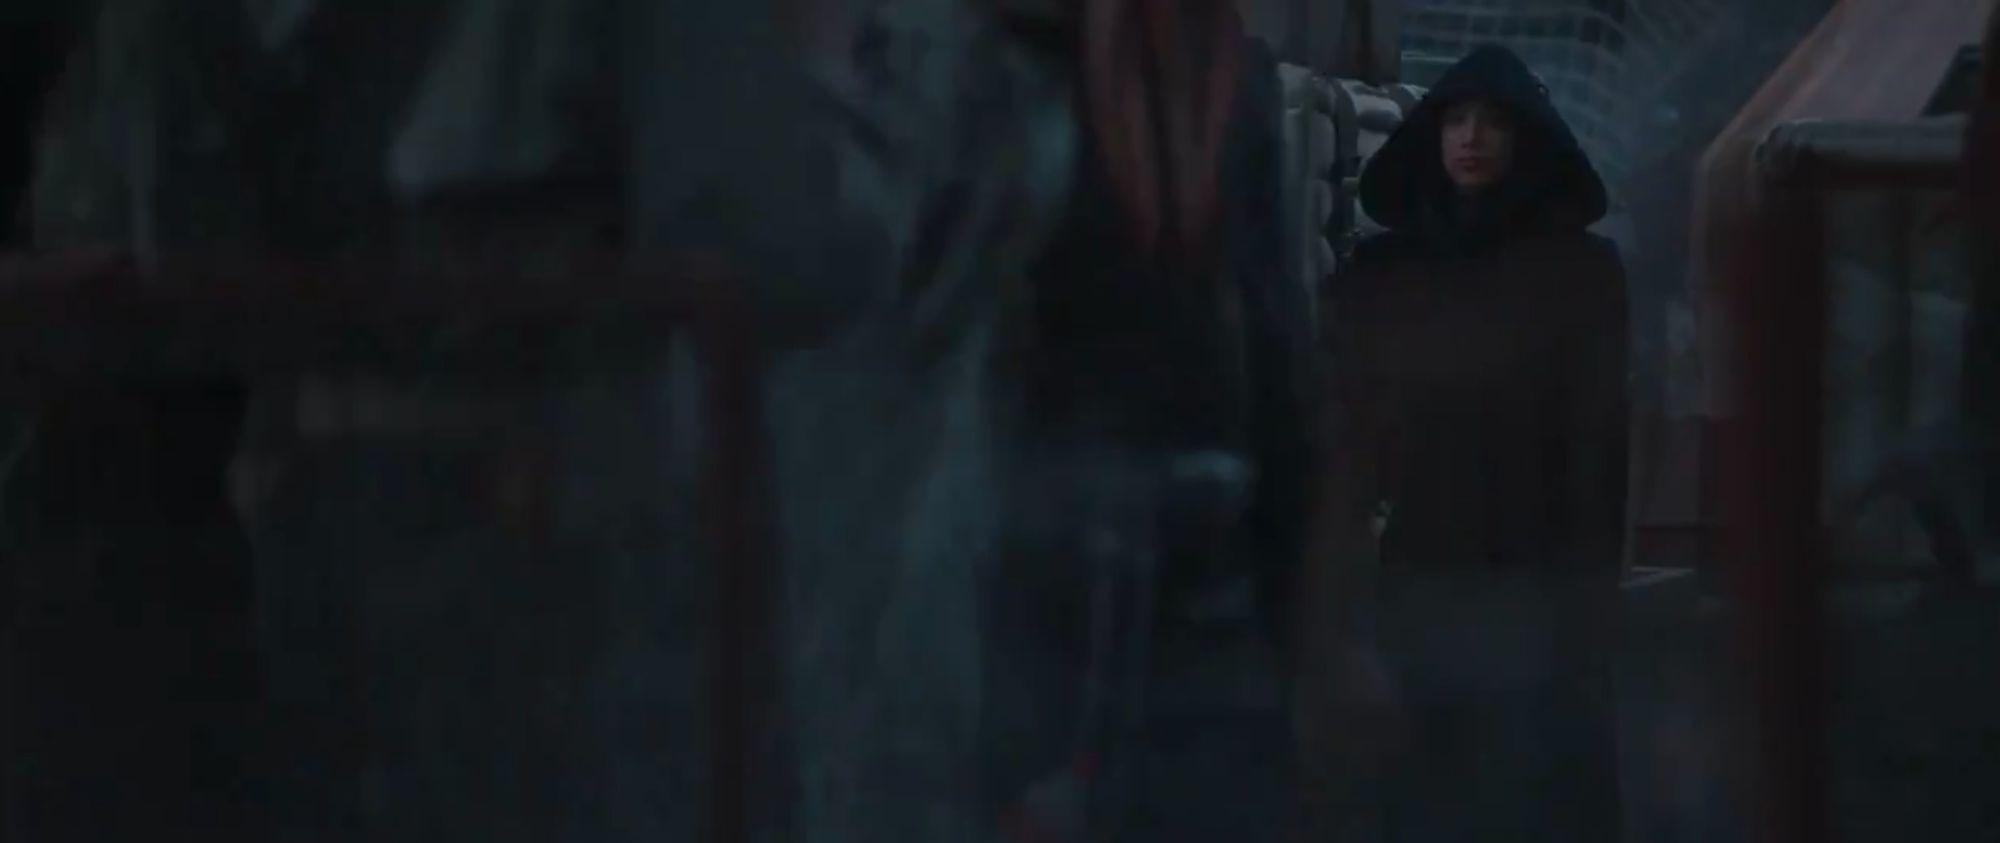 A screencap from The Mandalorian Season 2 trailer featuring Sasha Banks.